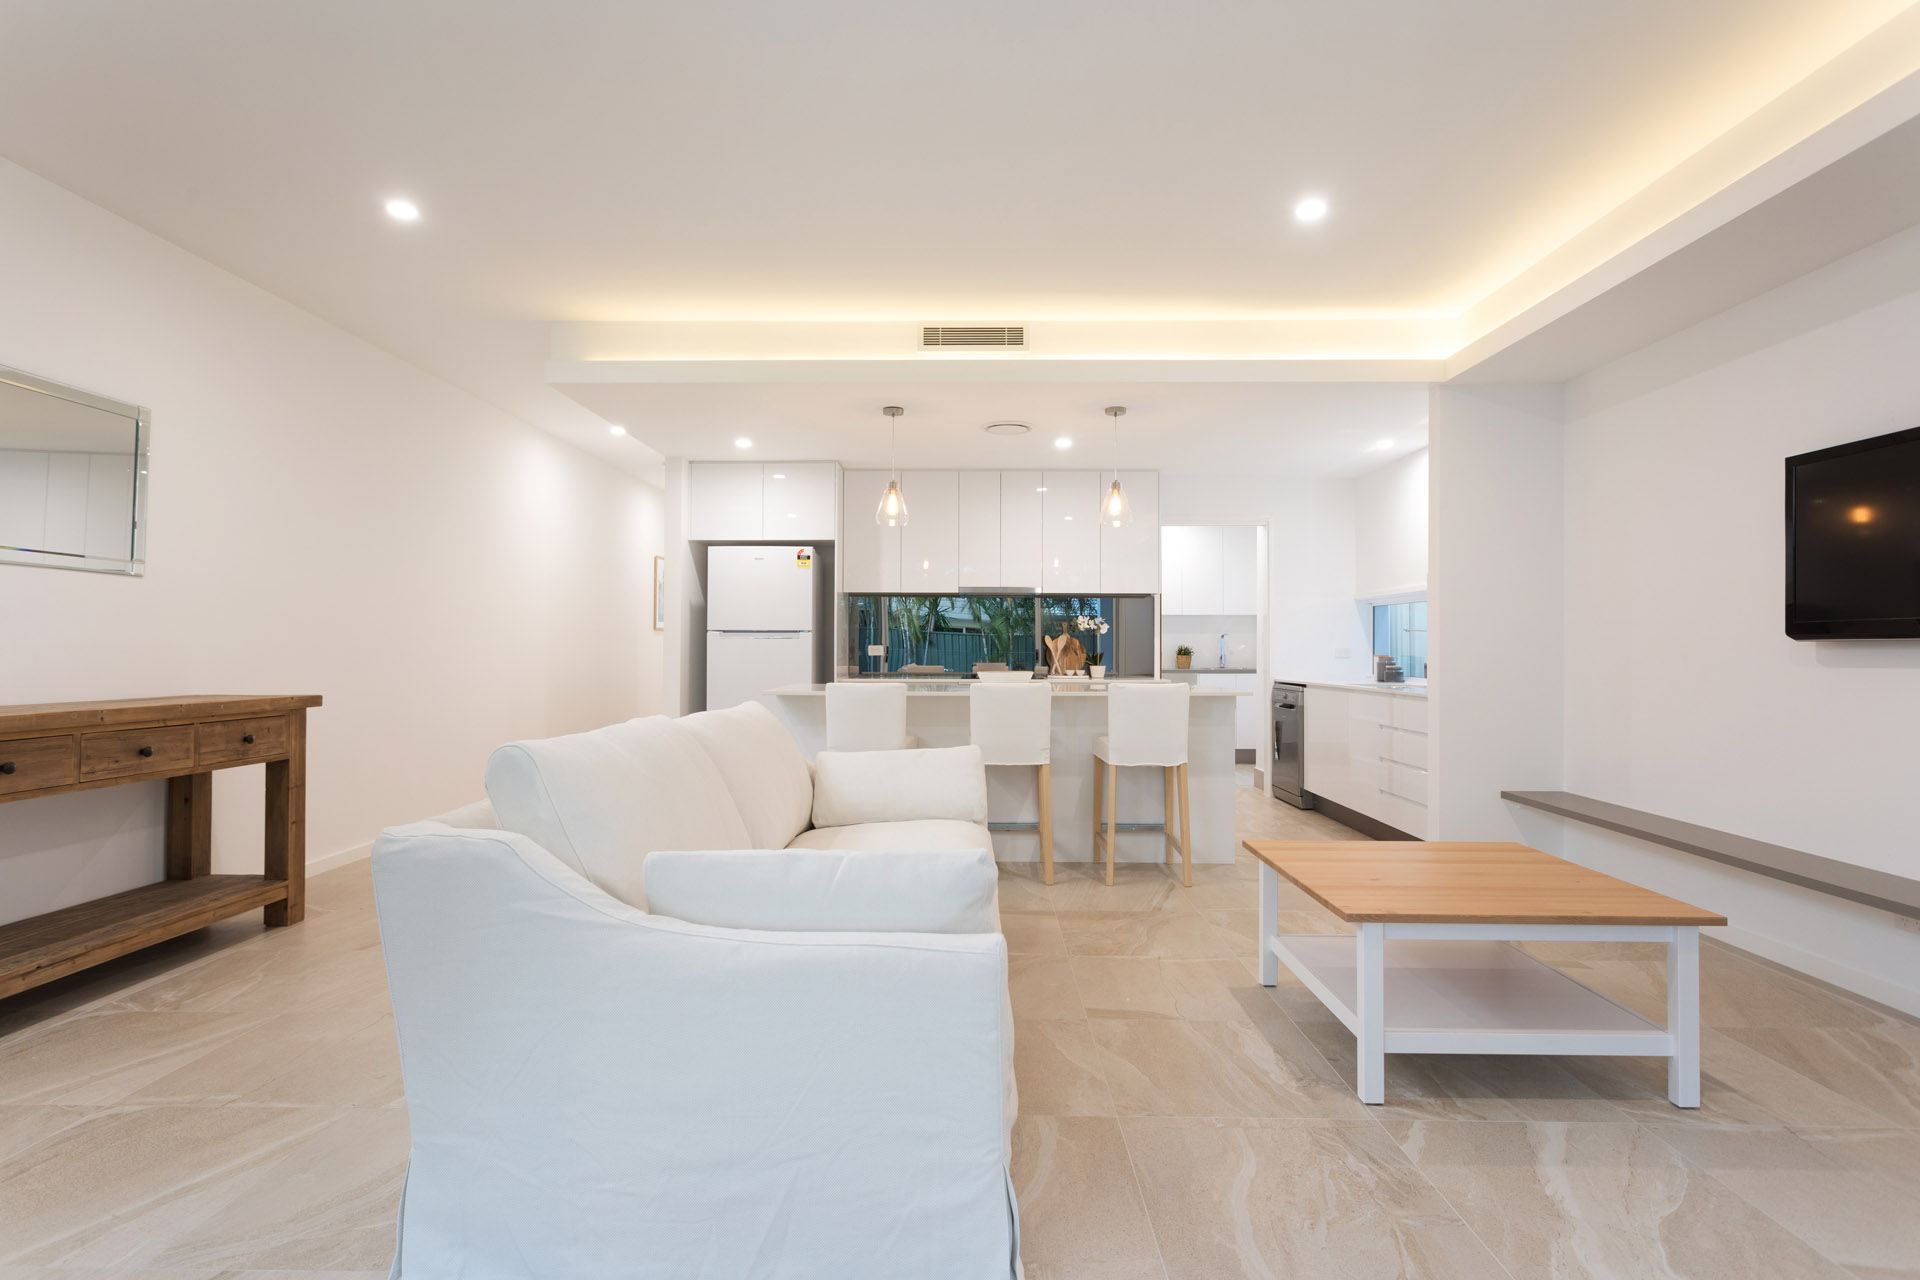 Real Estate | Gold Coast | Chevron Realty | 20180822 0b4a7023